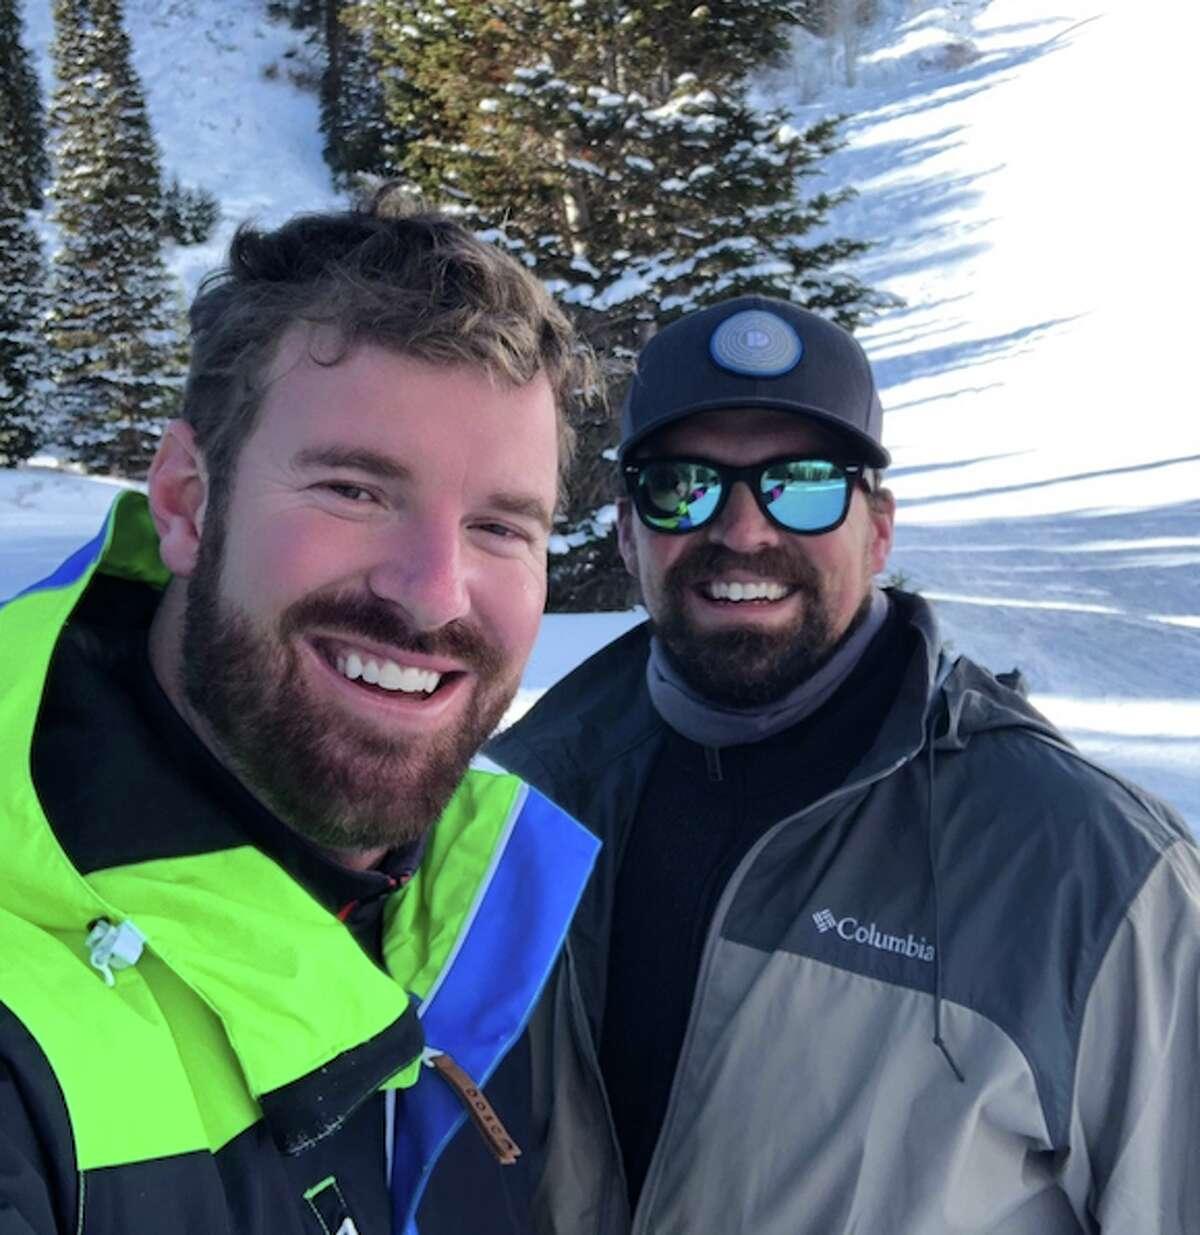 former 'Bachelorette' contestant James McCoy Taylor, left, skiing in Utah on Jan. 7.